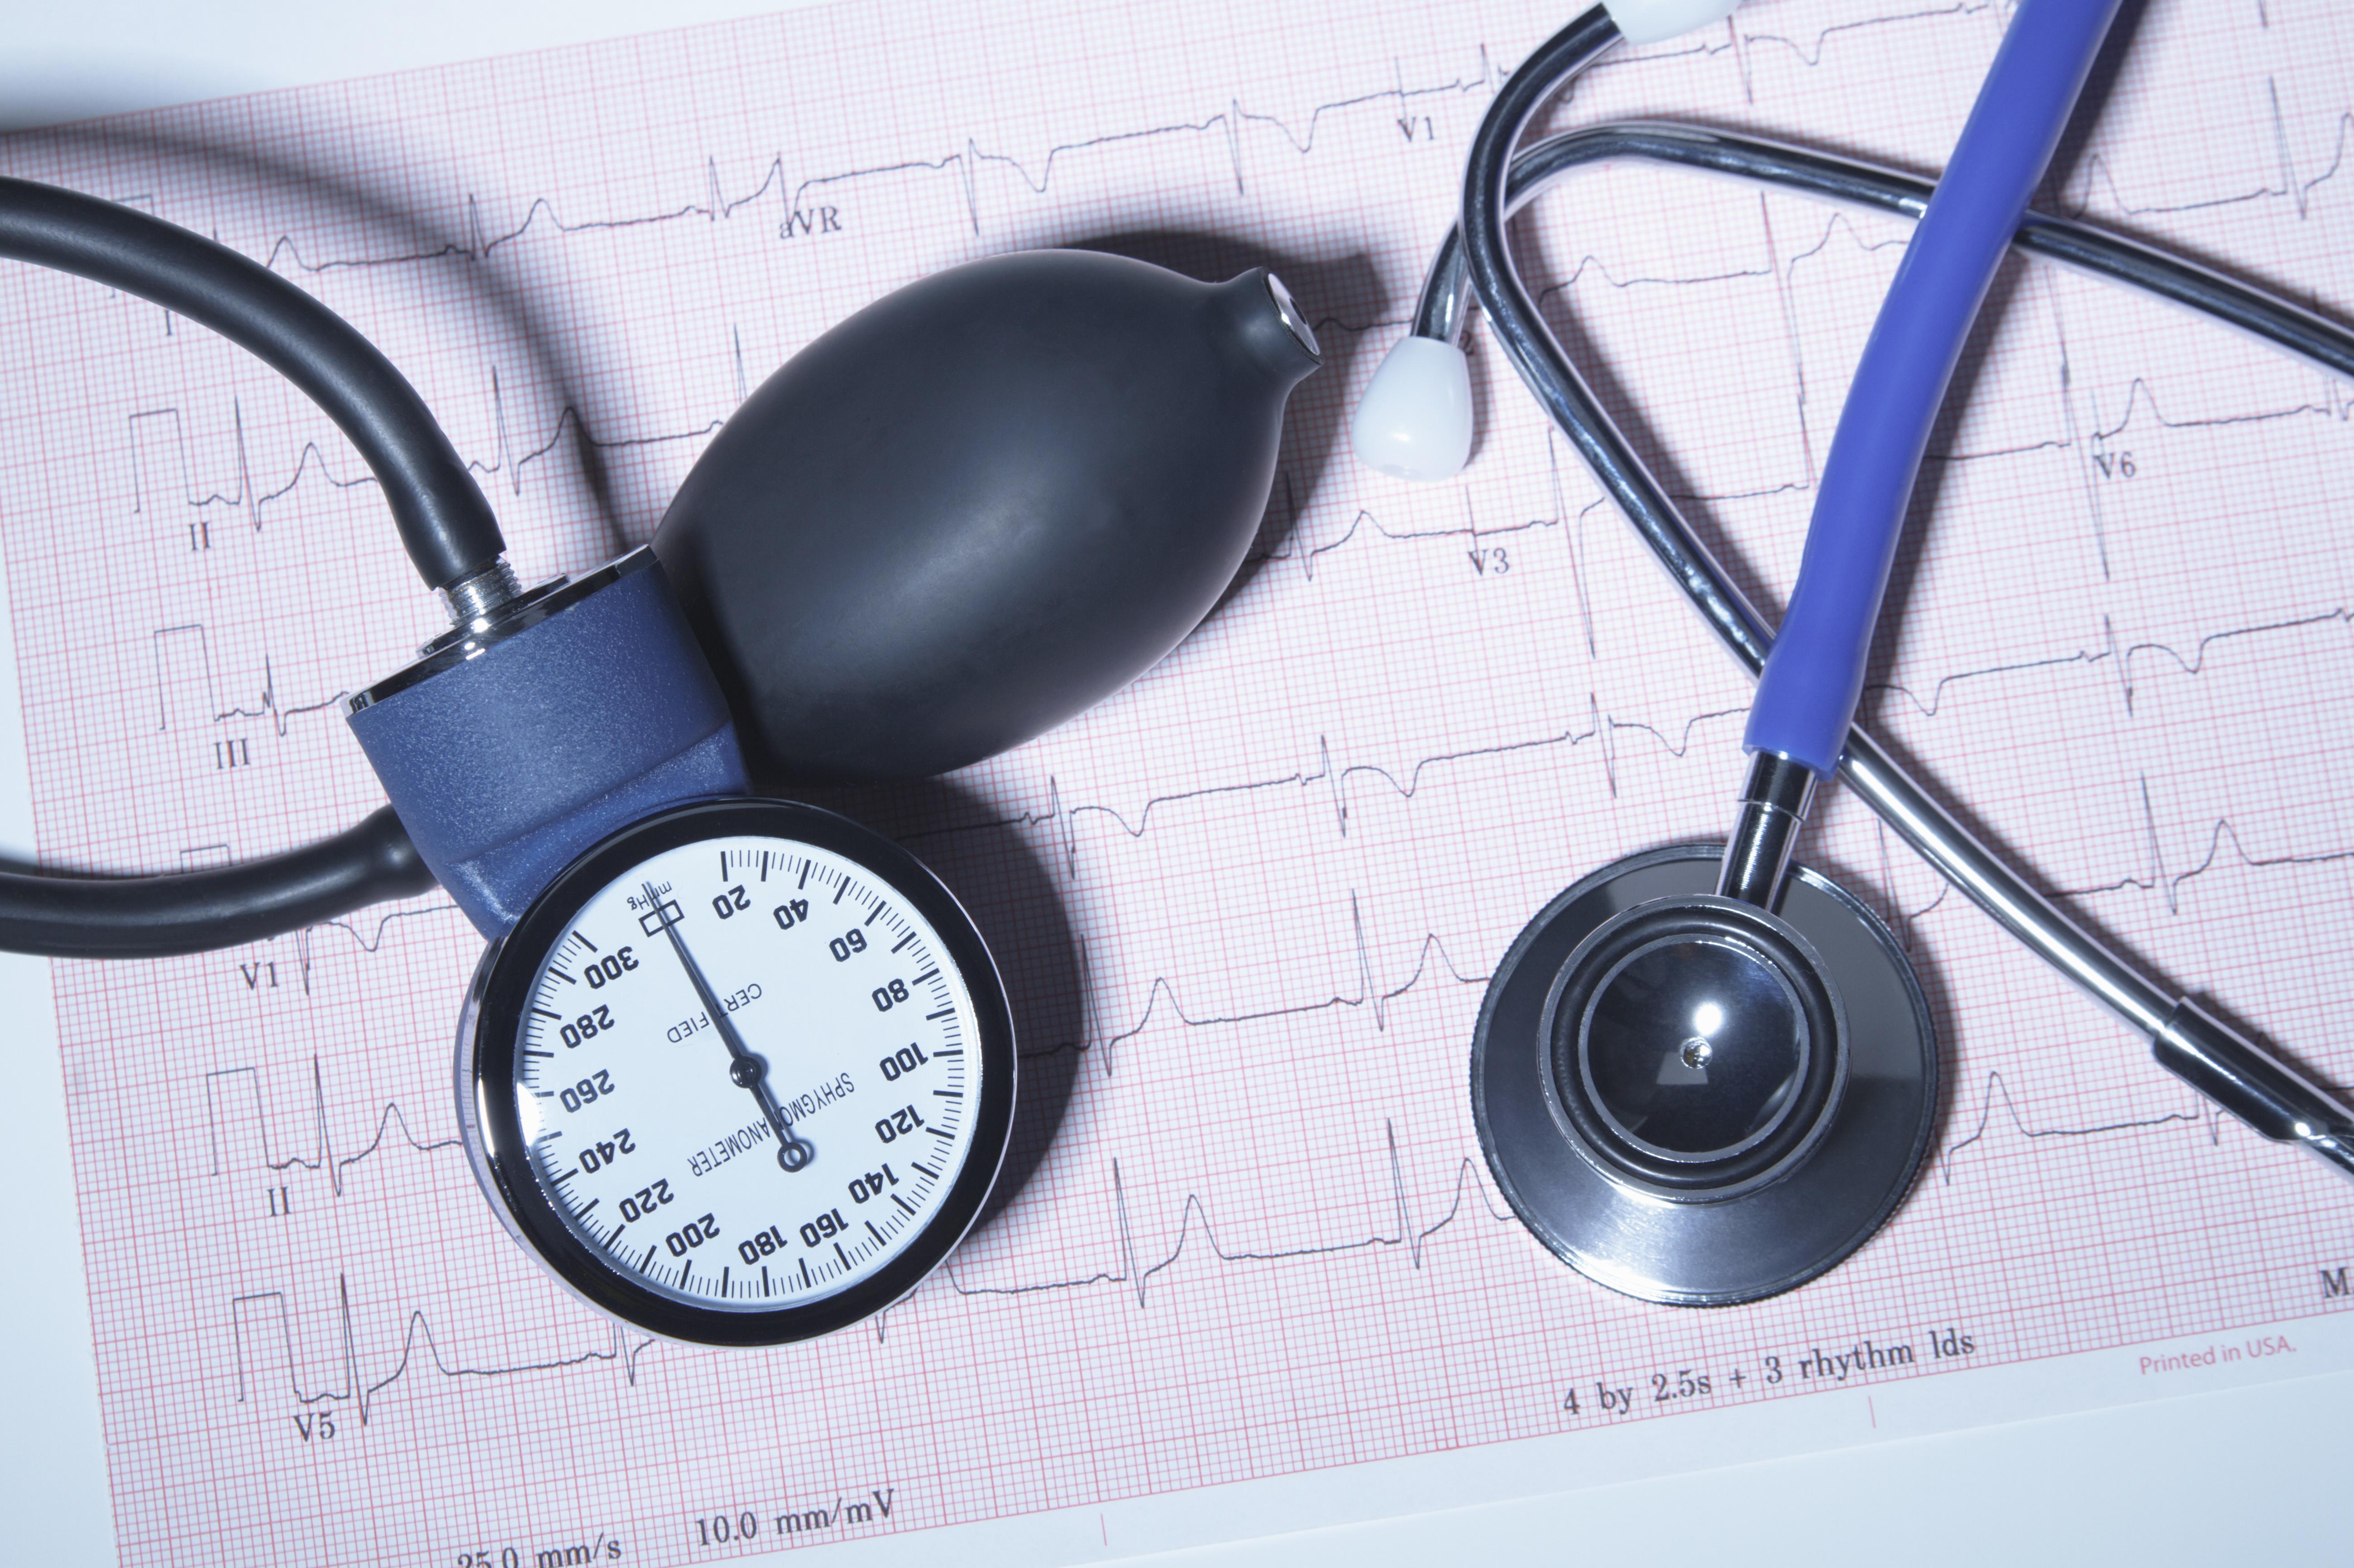 az embereknél a magas vérnyomás gén dominál a magas vérnyomás gyermekeknél csökken